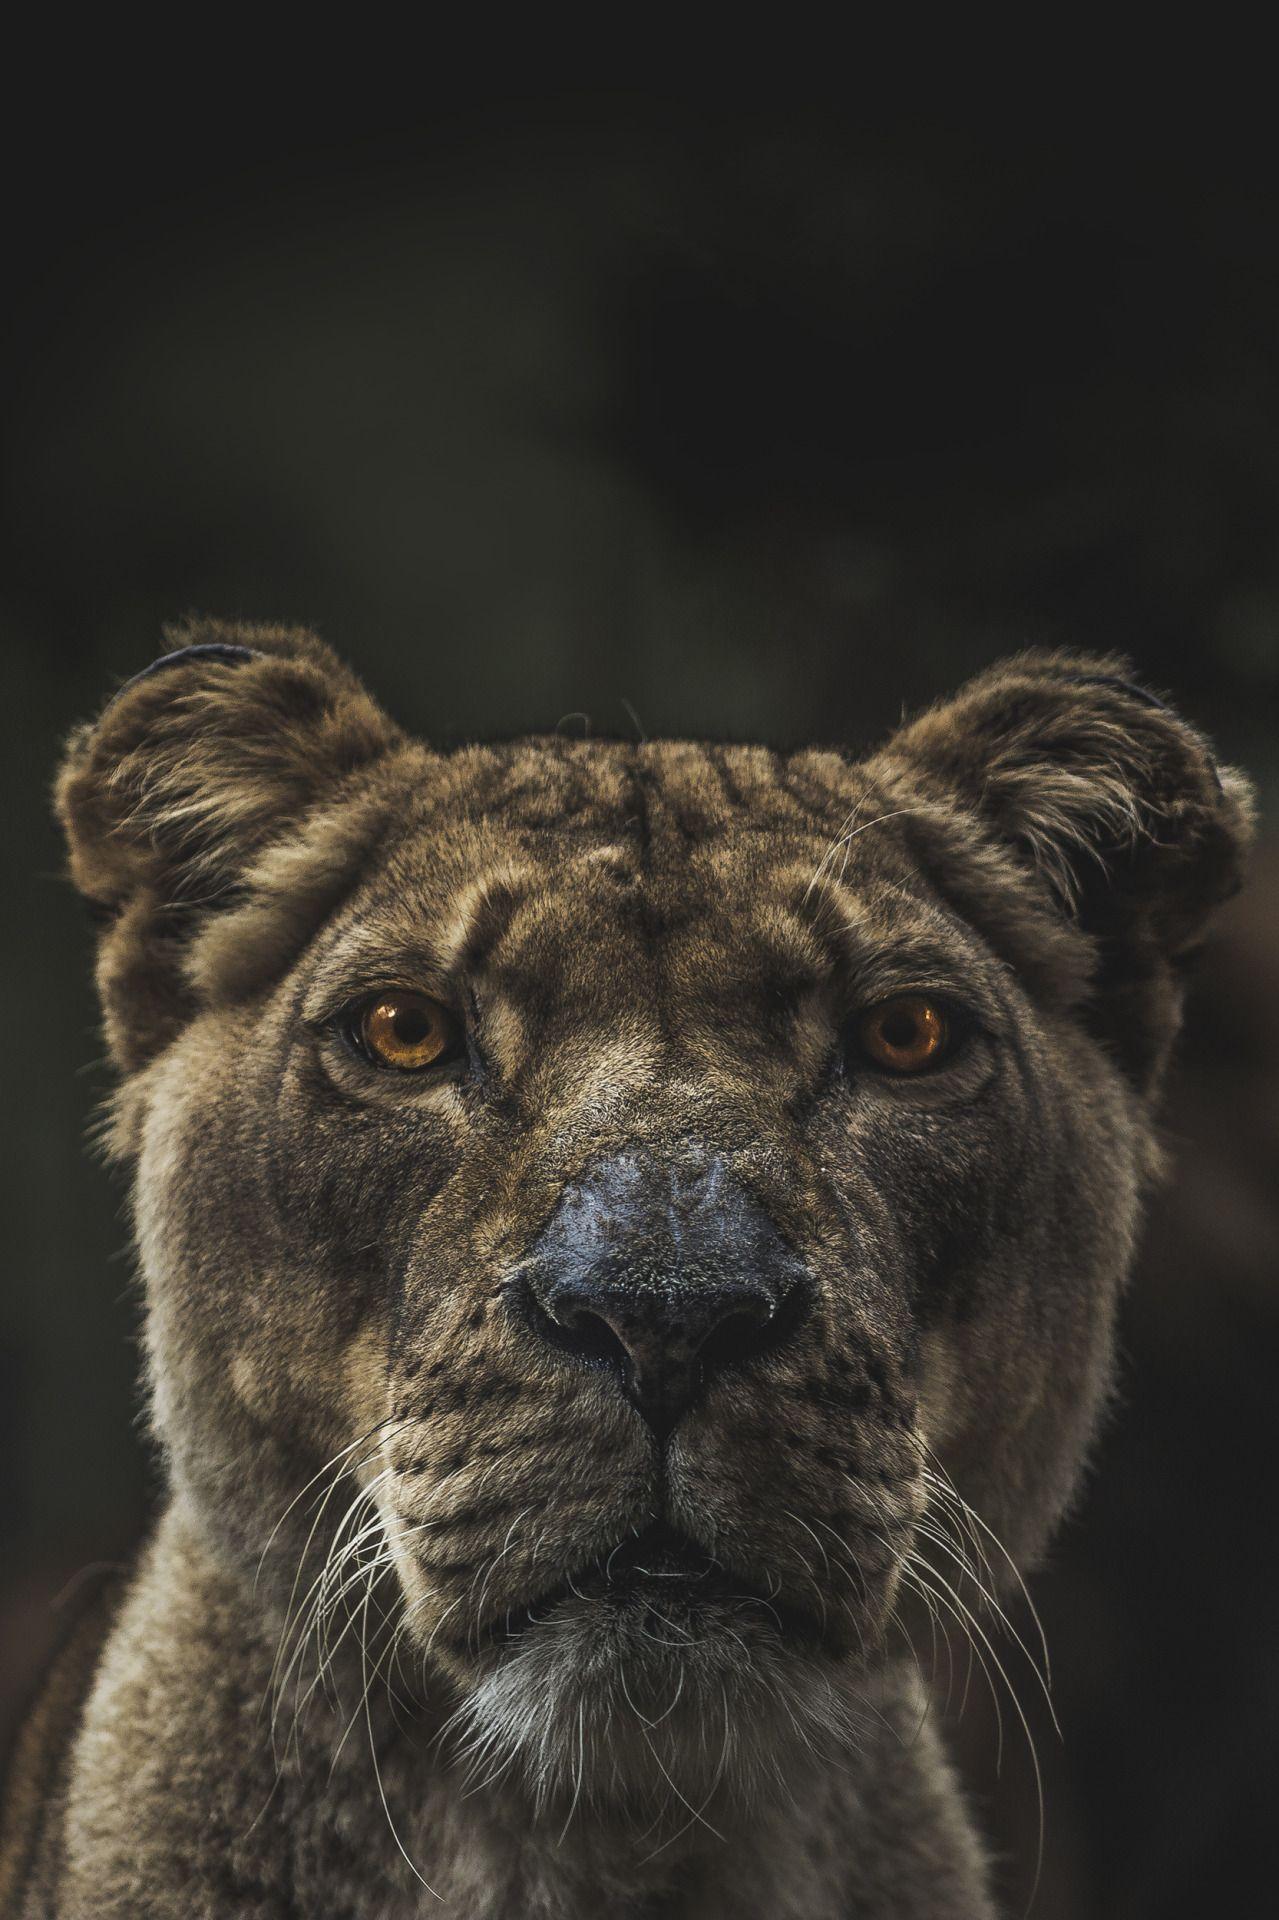 Envyavenue If Looks Could Kill By Sam Scrimshaw Tiere Niedliche Tiere Susseste Haustiere